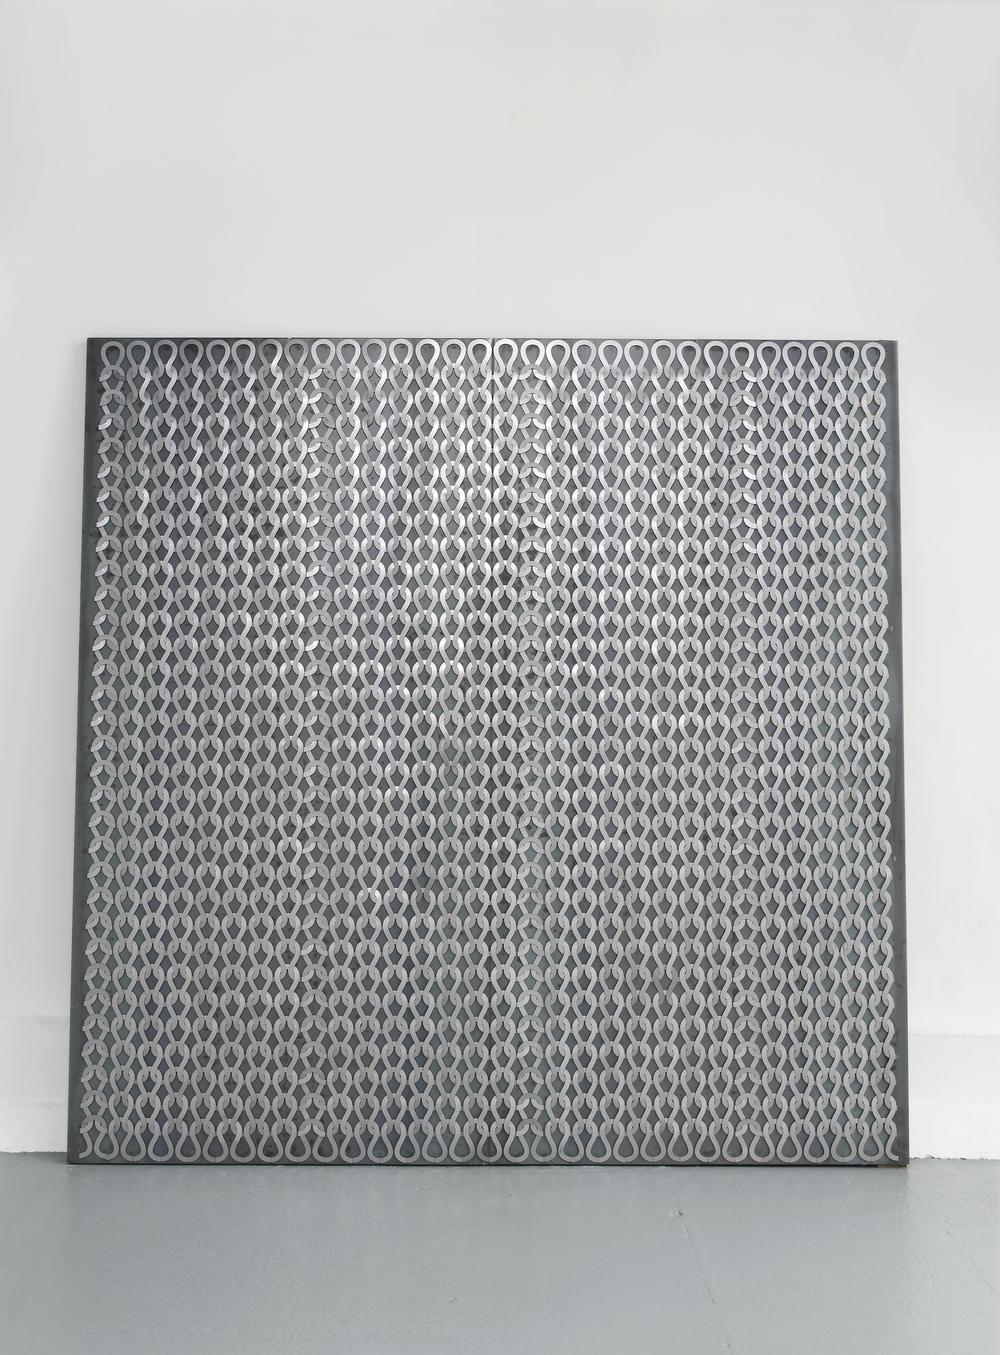 Uknit 2  2011  Steel, magnets  250 x 250 cm / 98.4 x 98.4 in